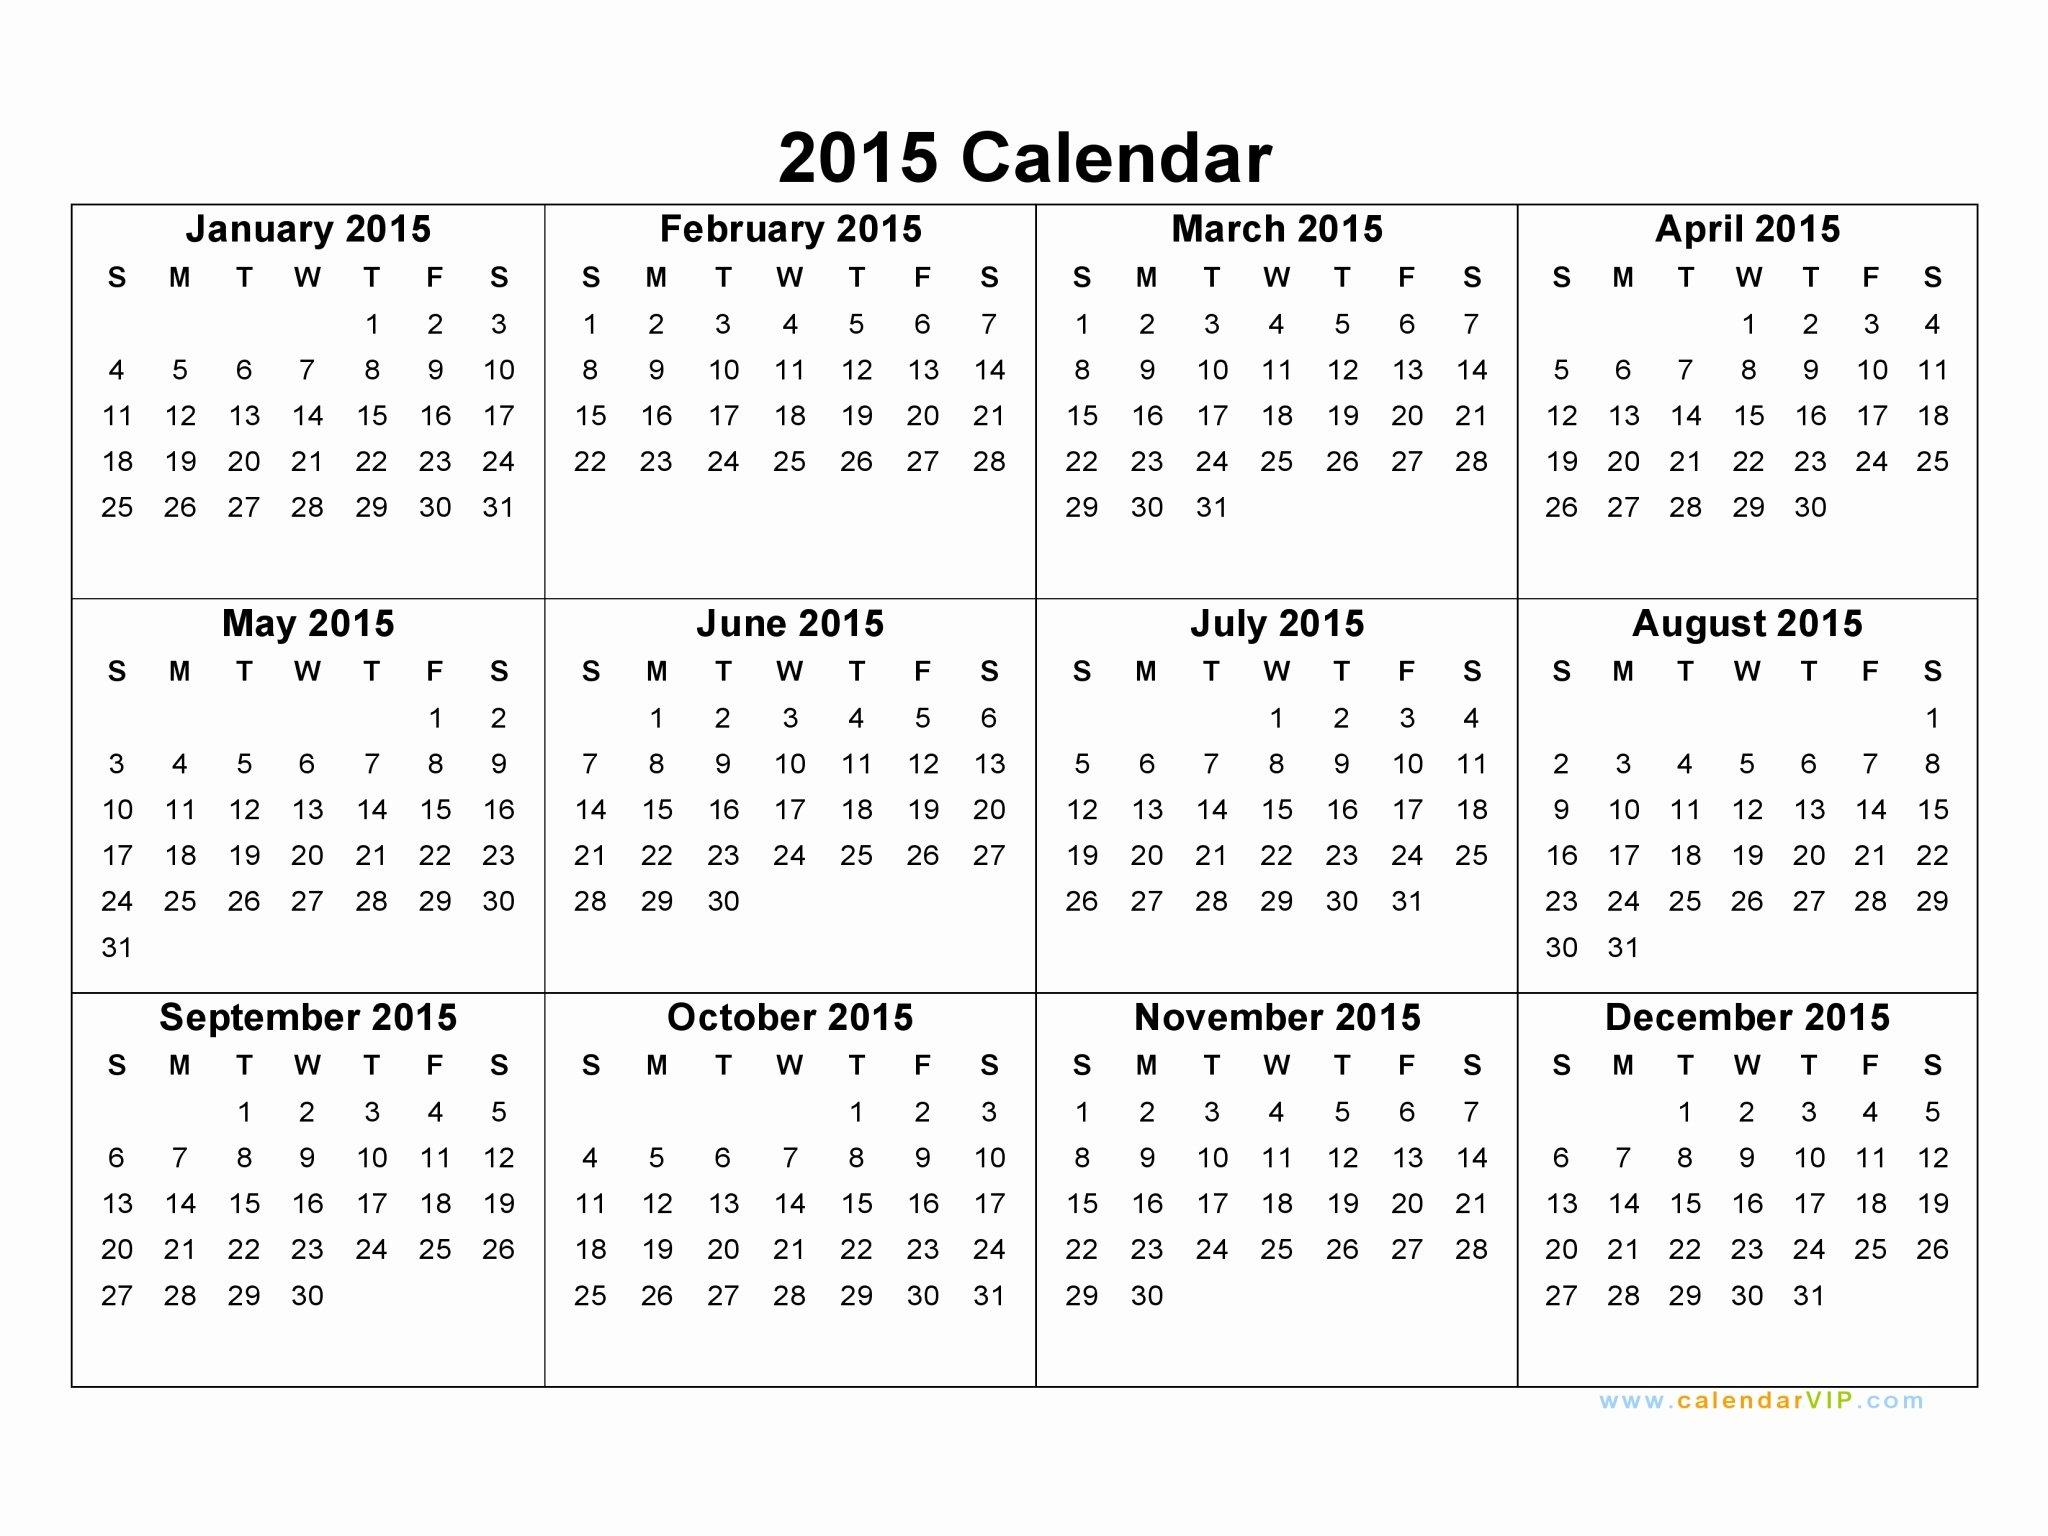 Payroll Calendar 2016 Template Elegant 2016 Payroll Calendar Template Blank